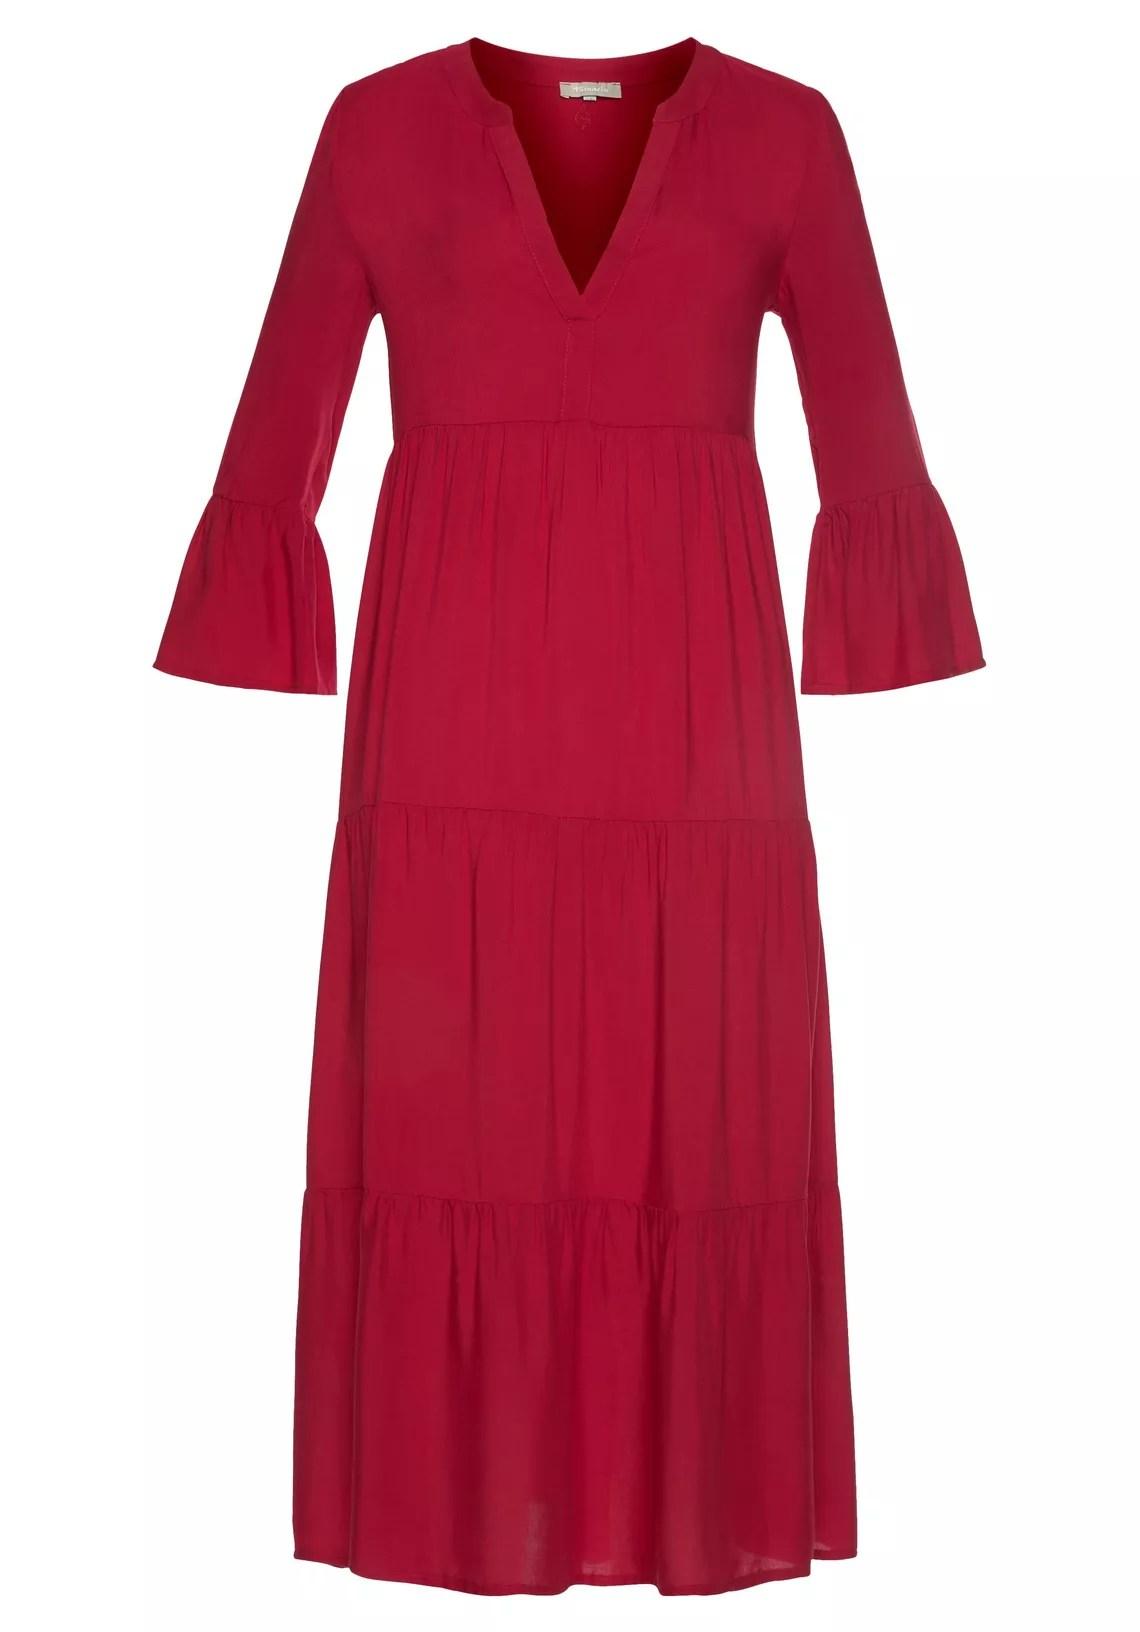 Tamaris maxi-jurk met volant mouwen